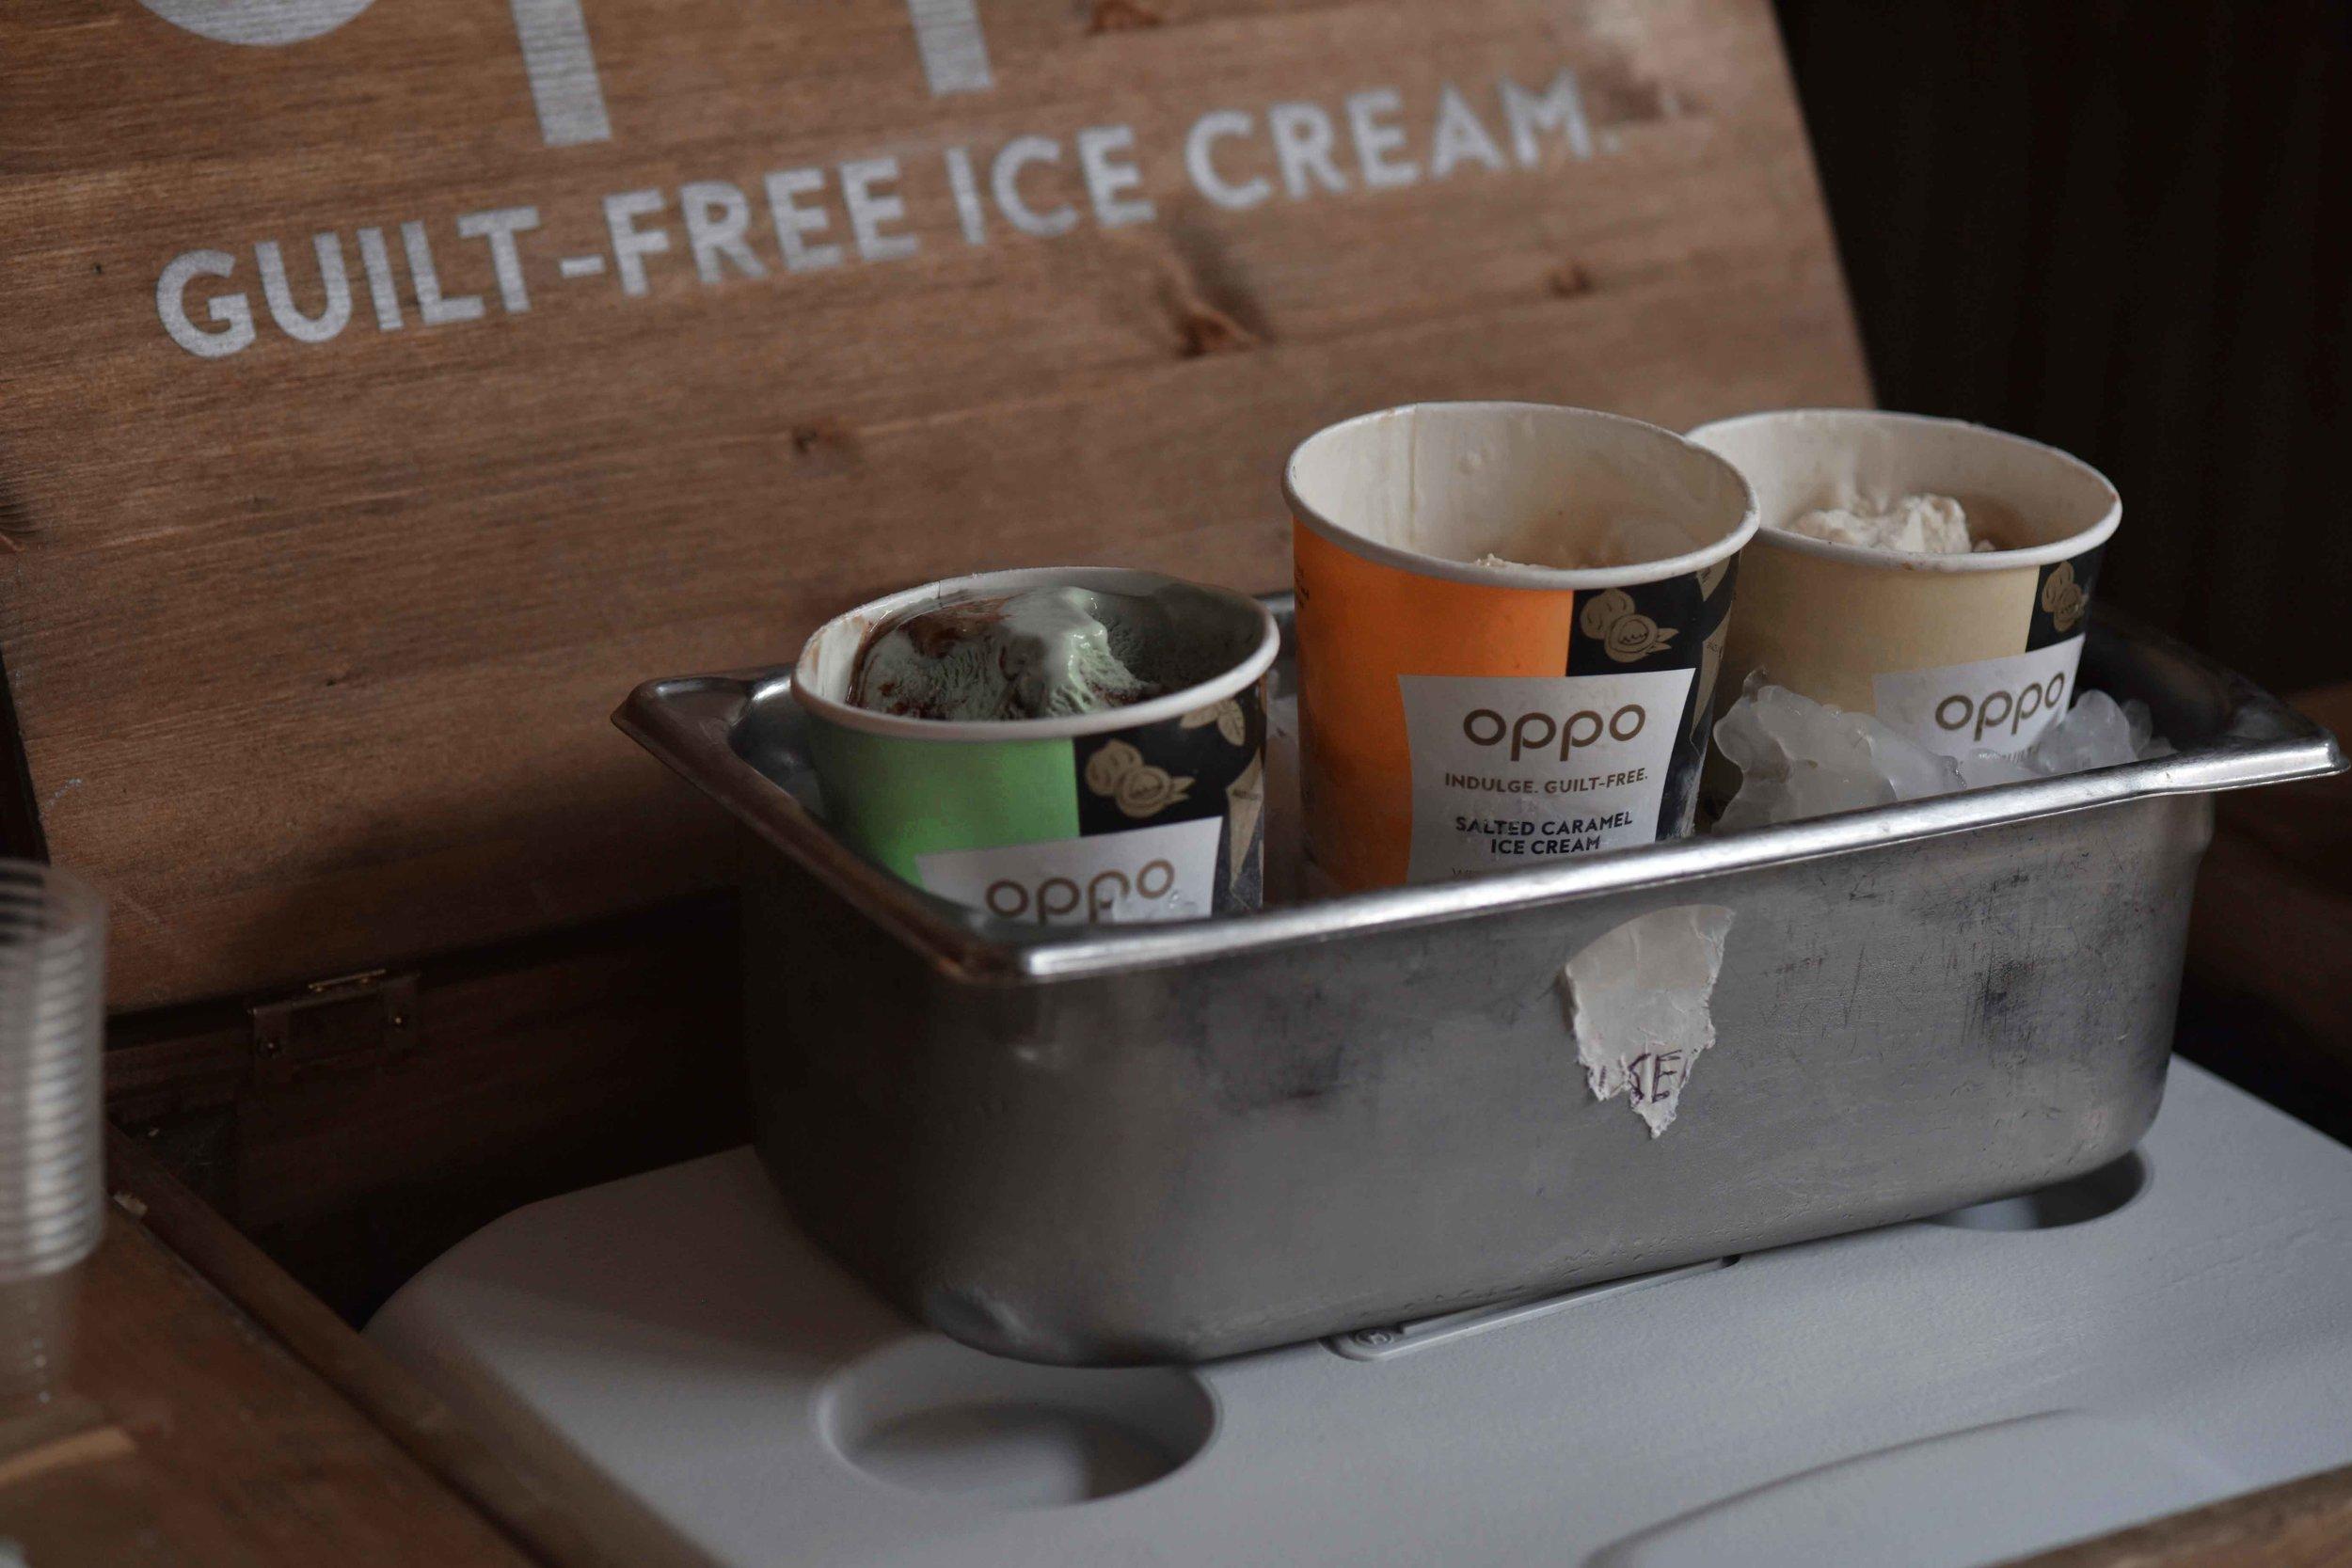 Guilt free Oppo ice-cream, High Street Kensington, London. Image©sourcingstyle.com